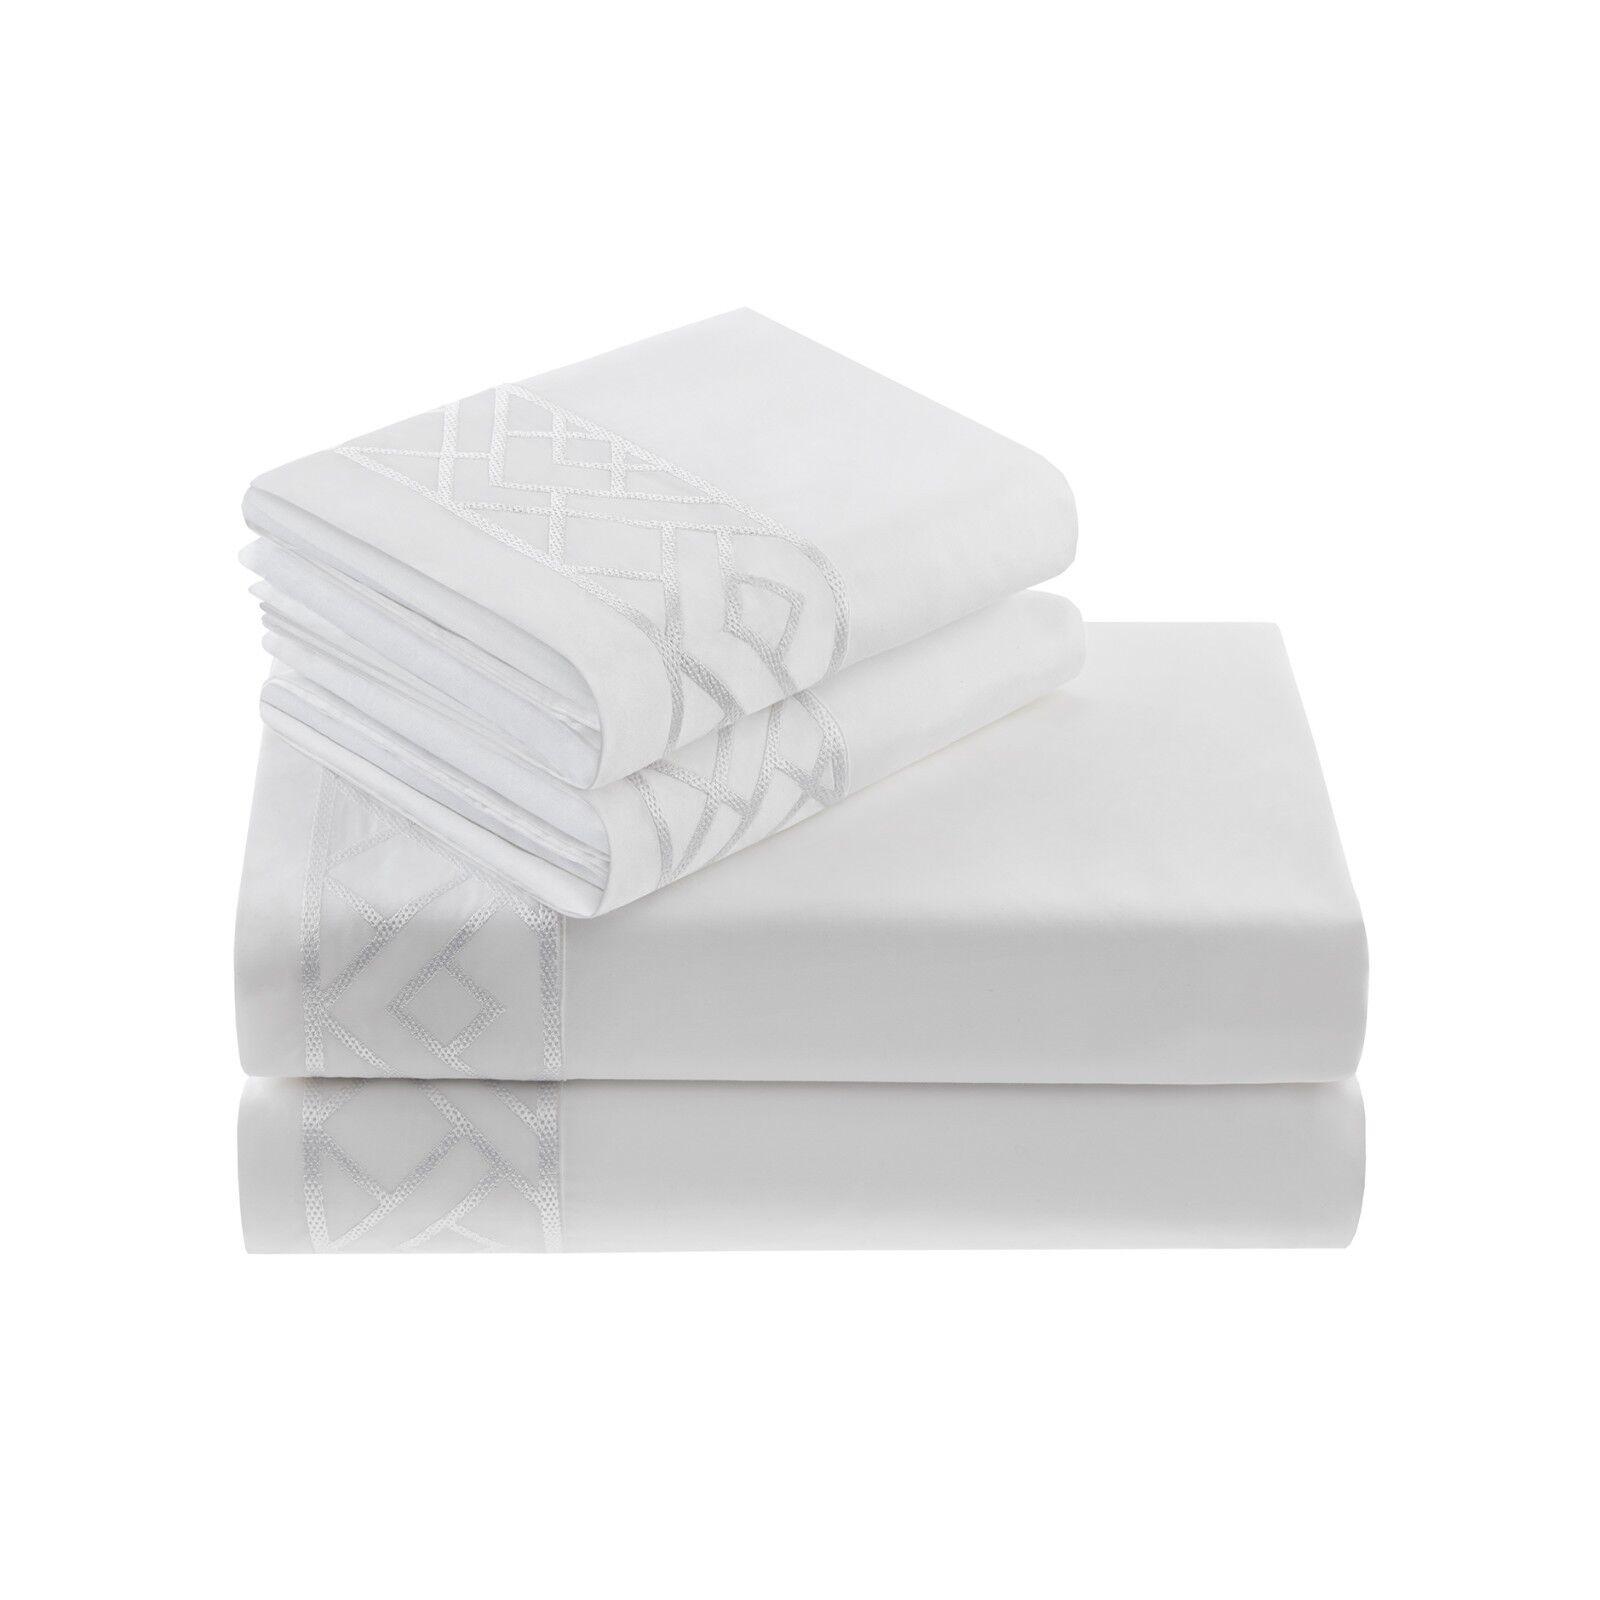 Natori tsuba geo cal-king Fitted Sheet White NA20-2464